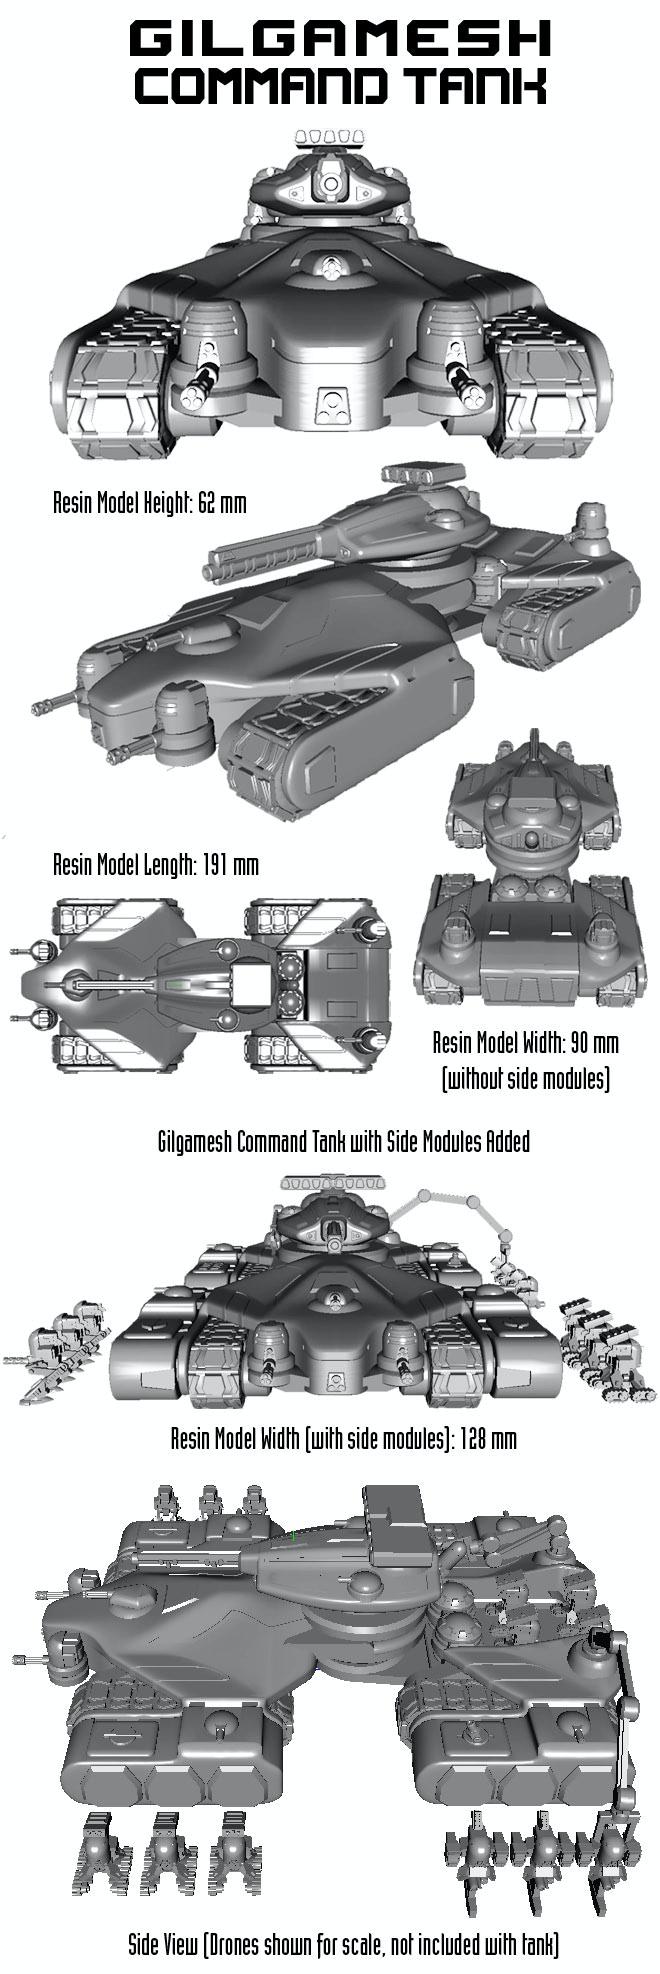 Gilgamesh 3d Model Images.